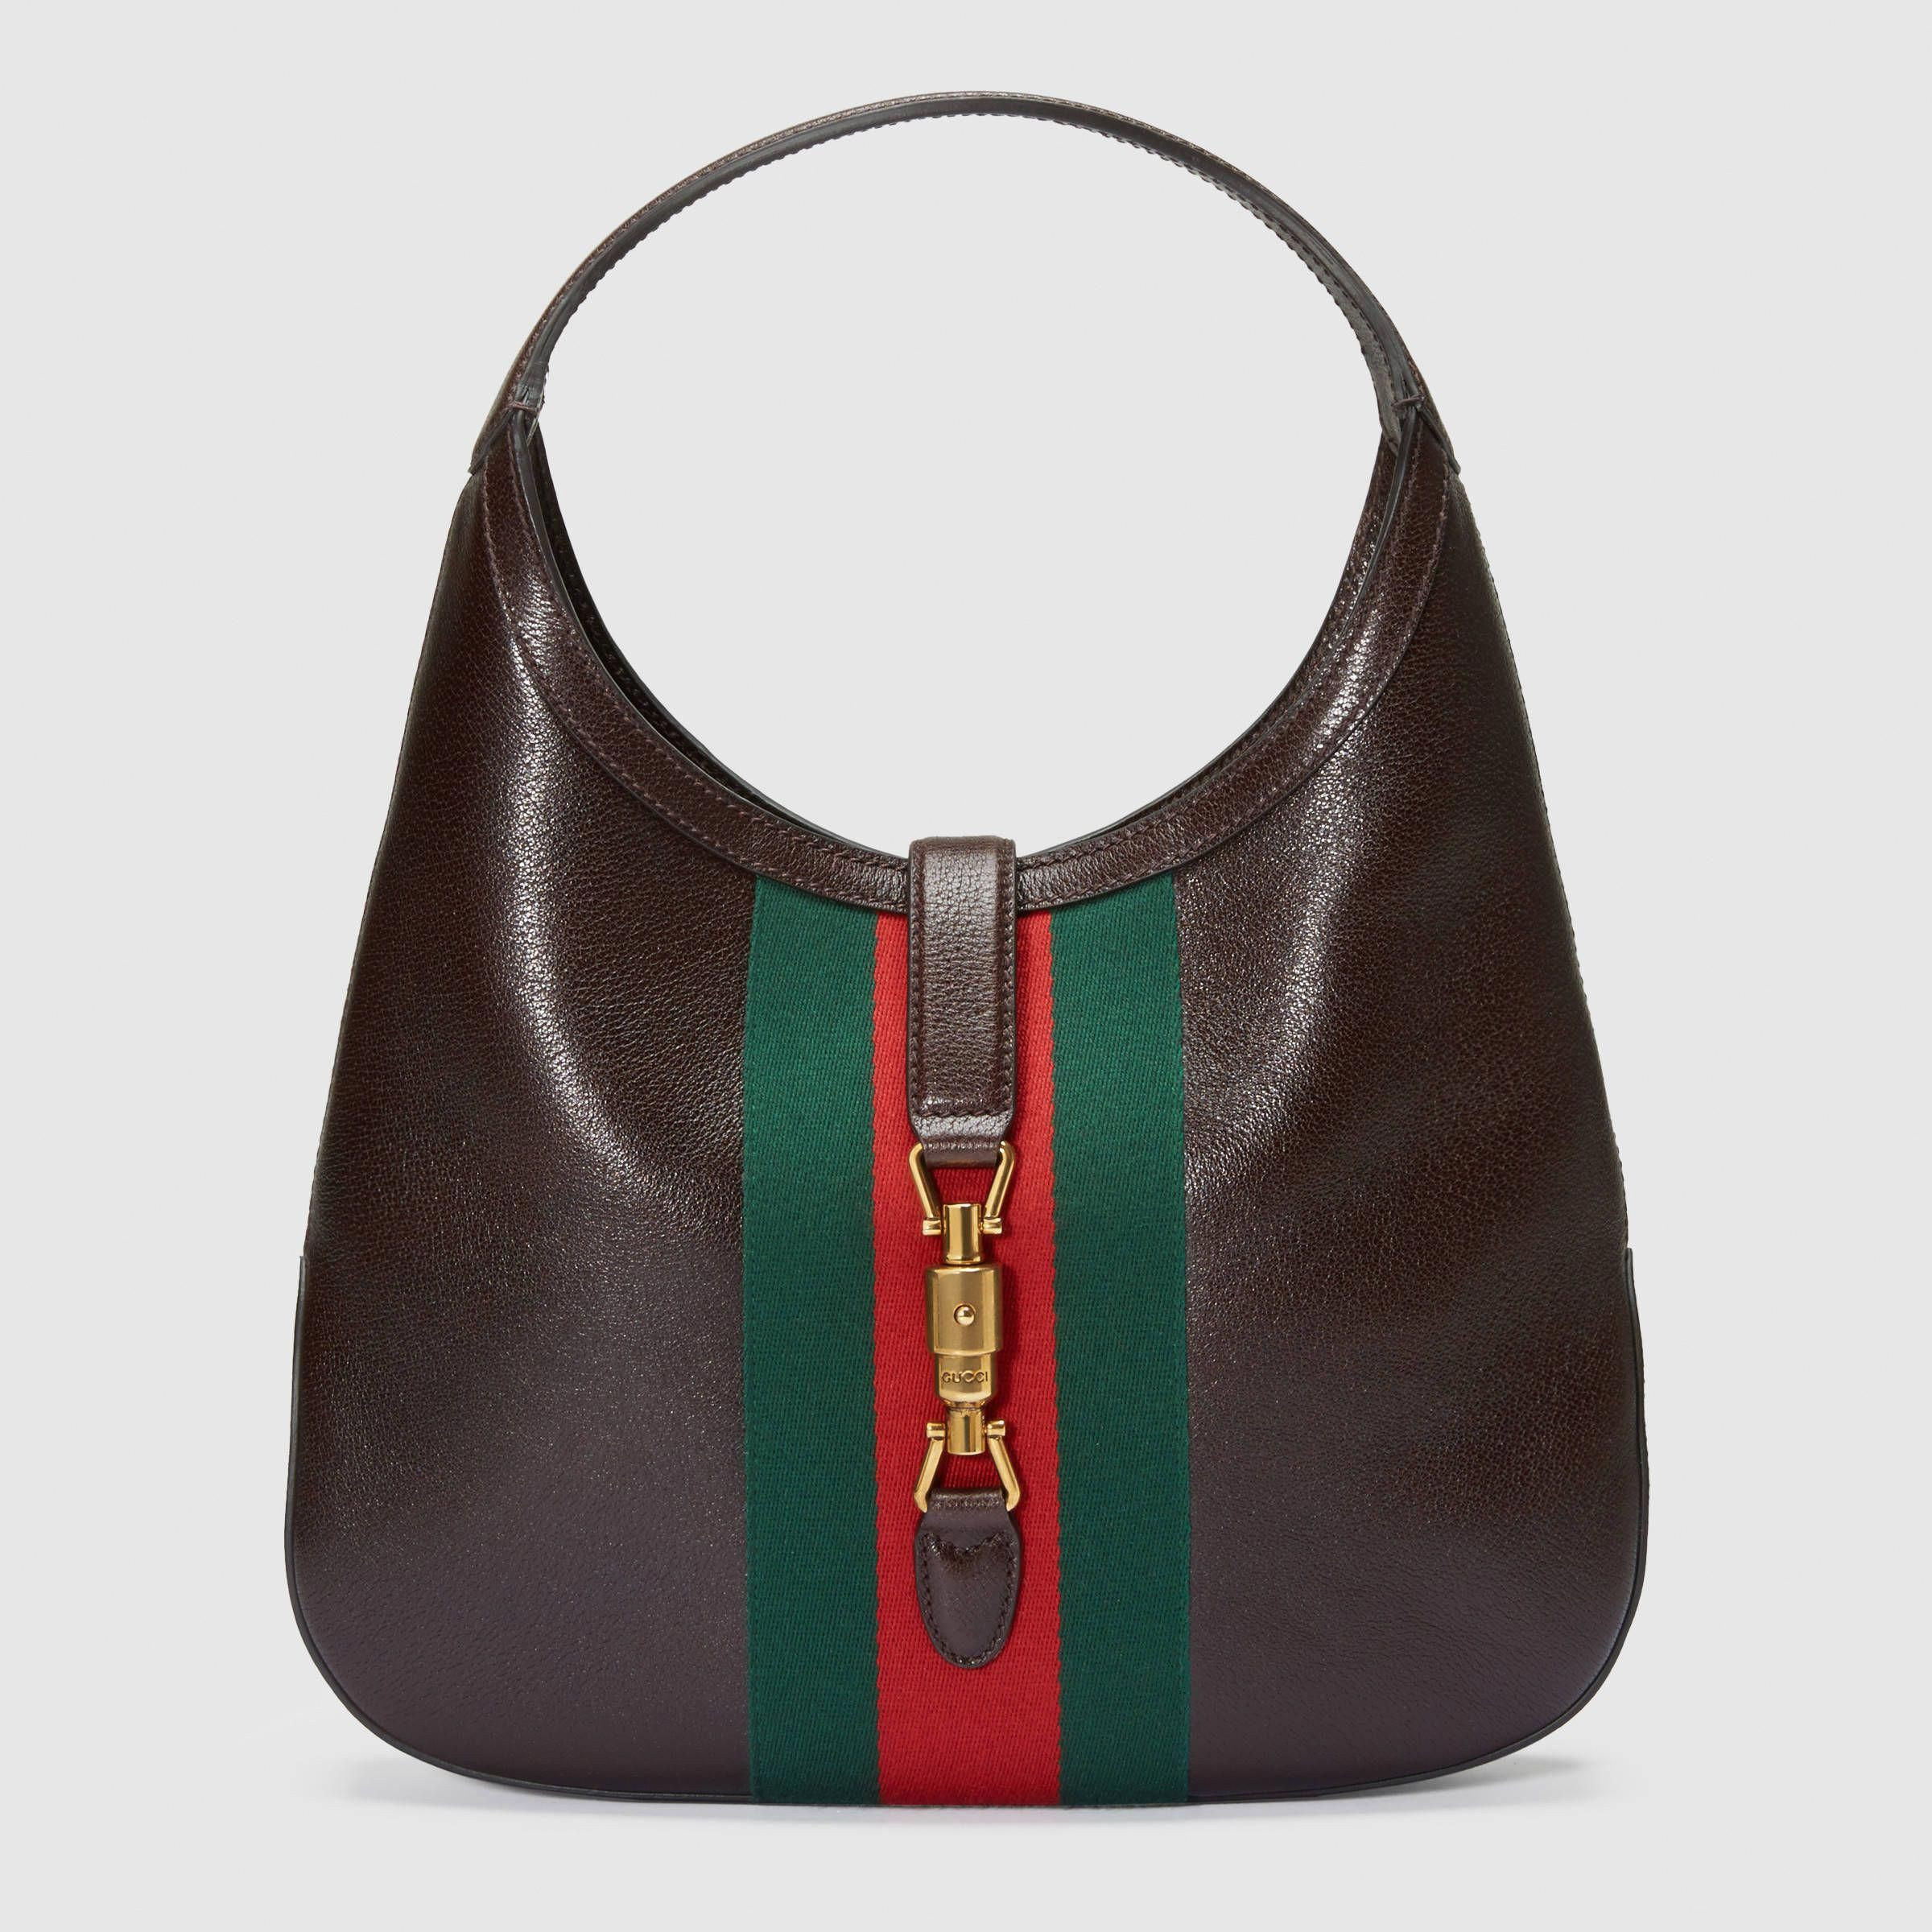 d2c08f9671 Borsa a spalla Jackie Soft in pelle - Gucci Borse 365458CWG1T2059  #Guccihandbags